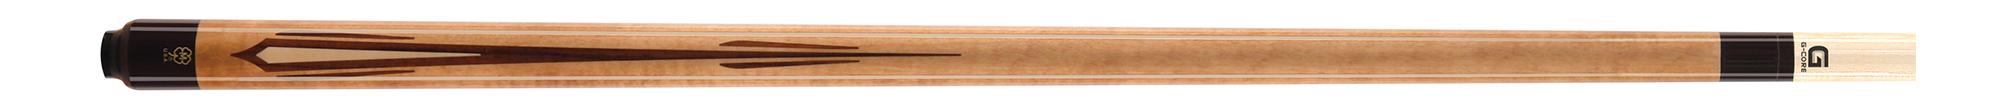 CK0959: McDermott CRM233 Walnut/Maple/inlay carom #1